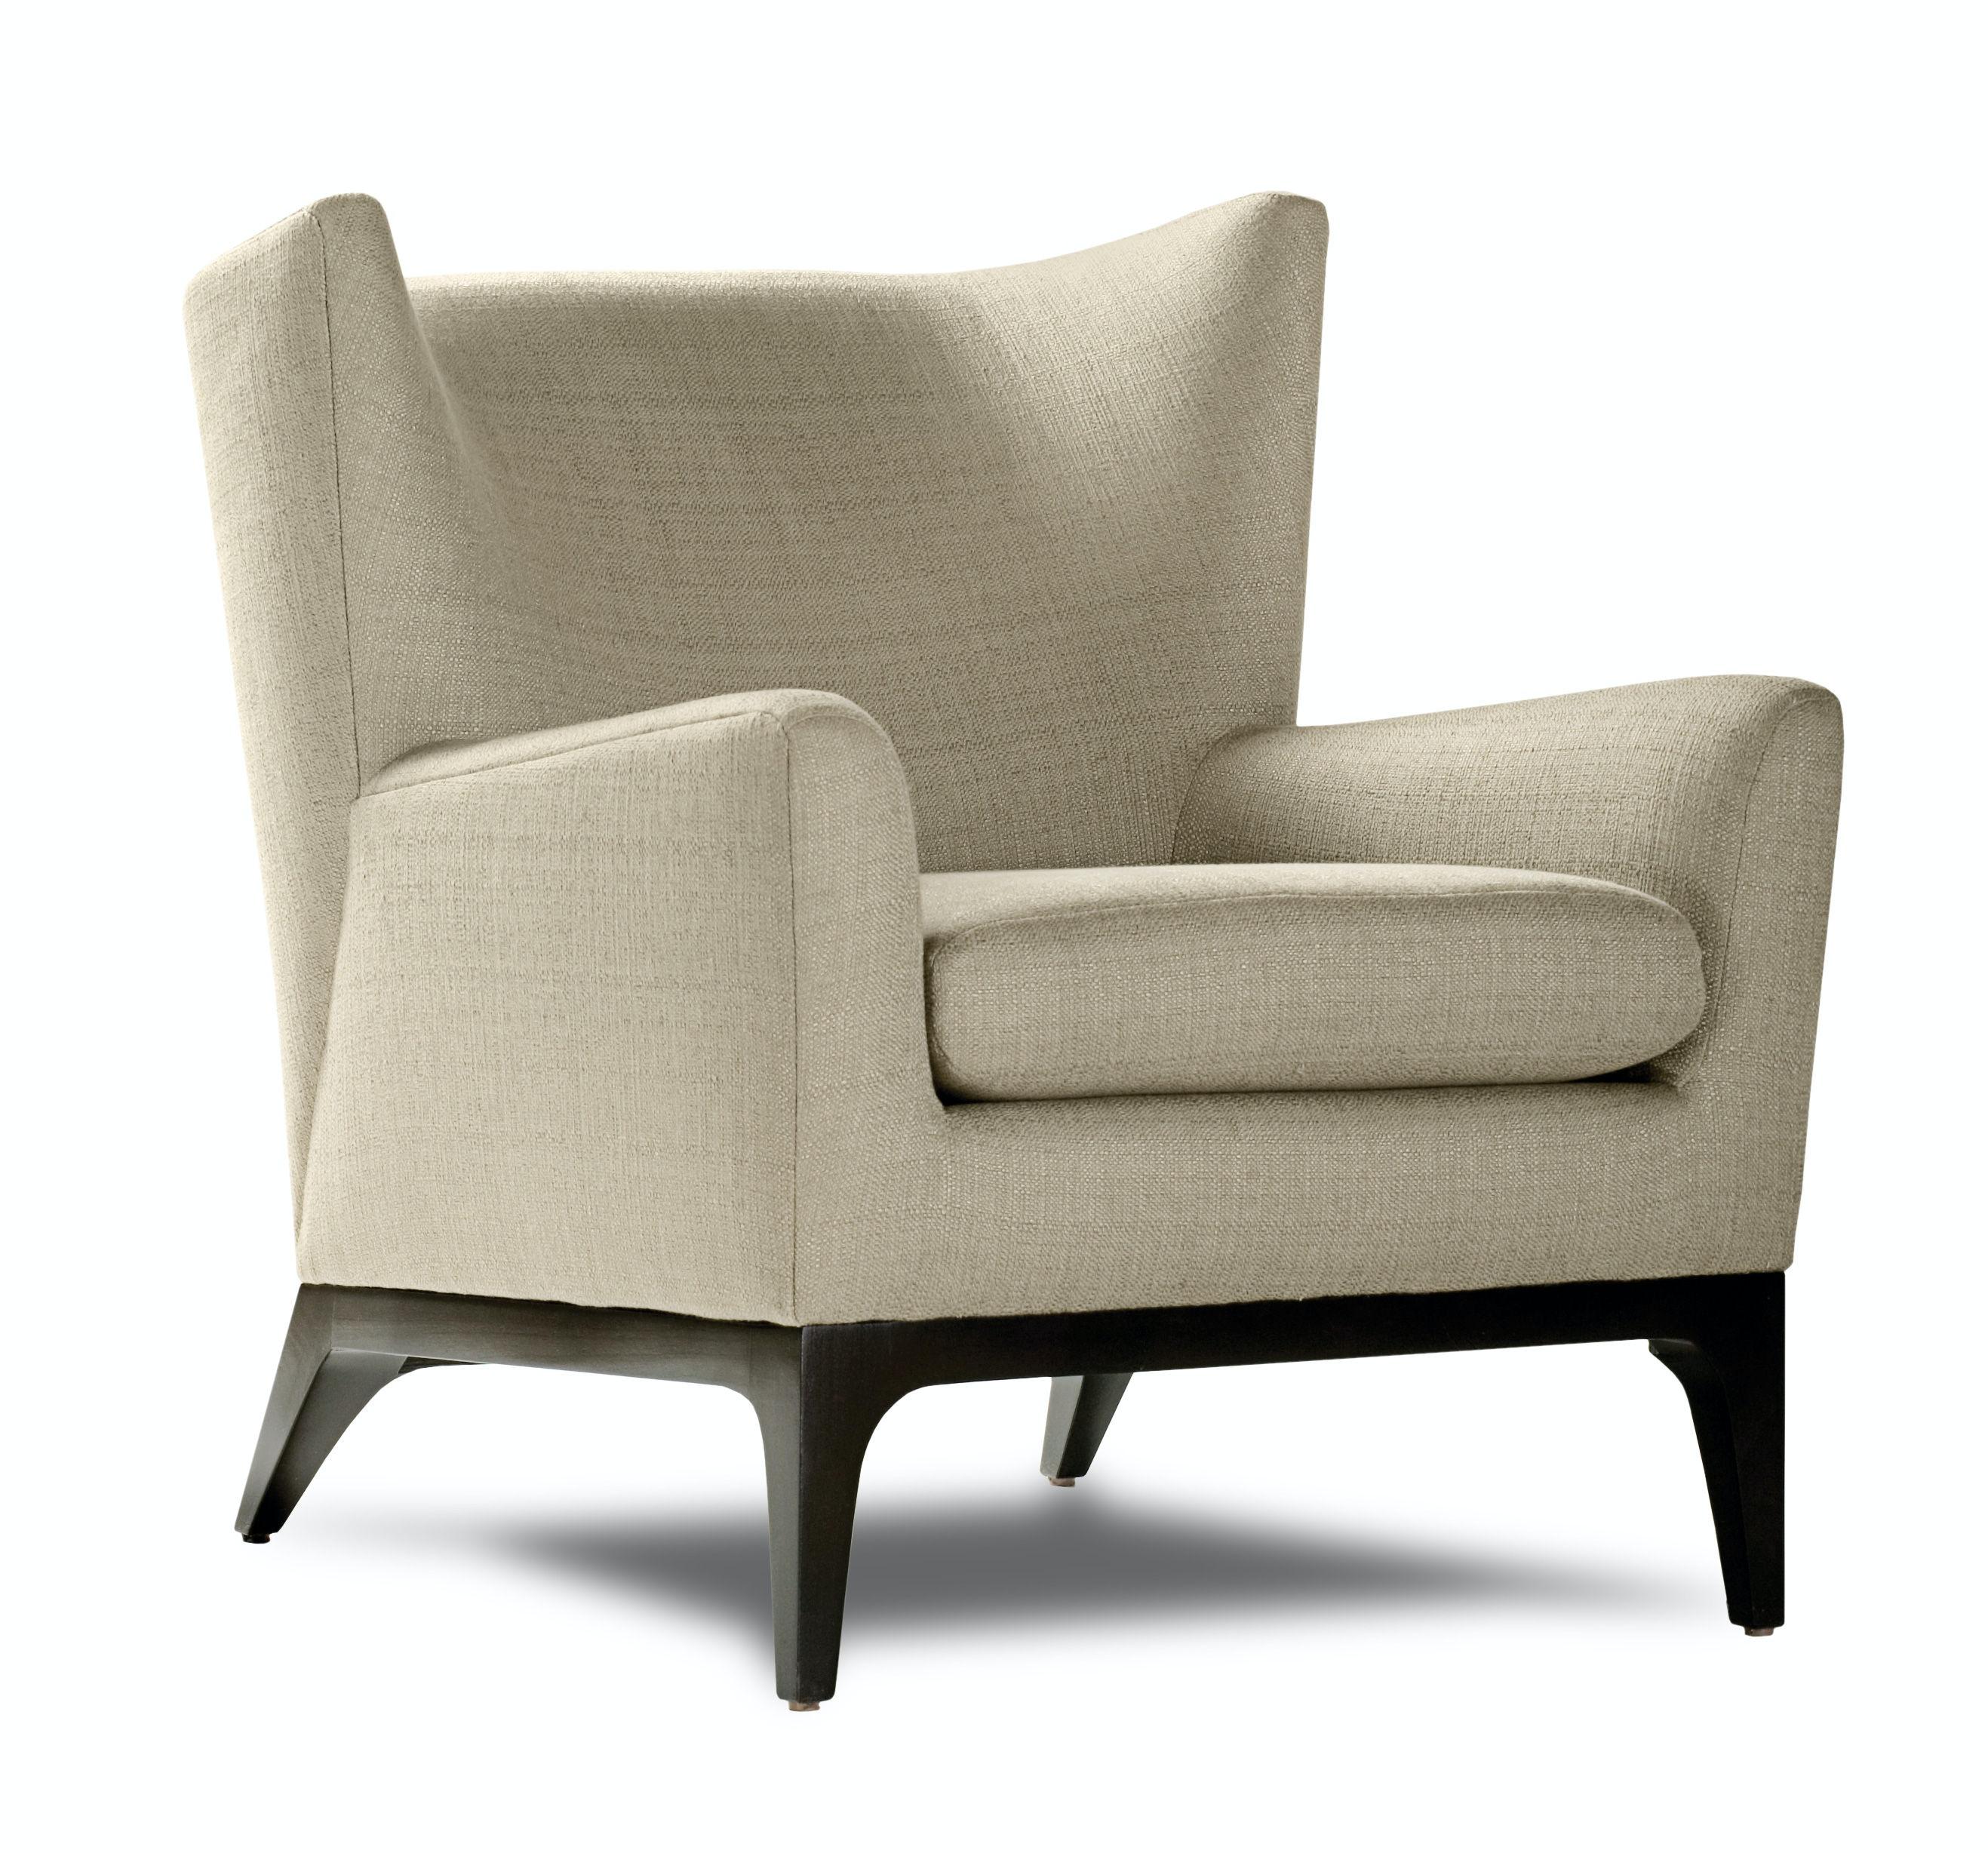 American Leather Furniture Goods Home Furnishings